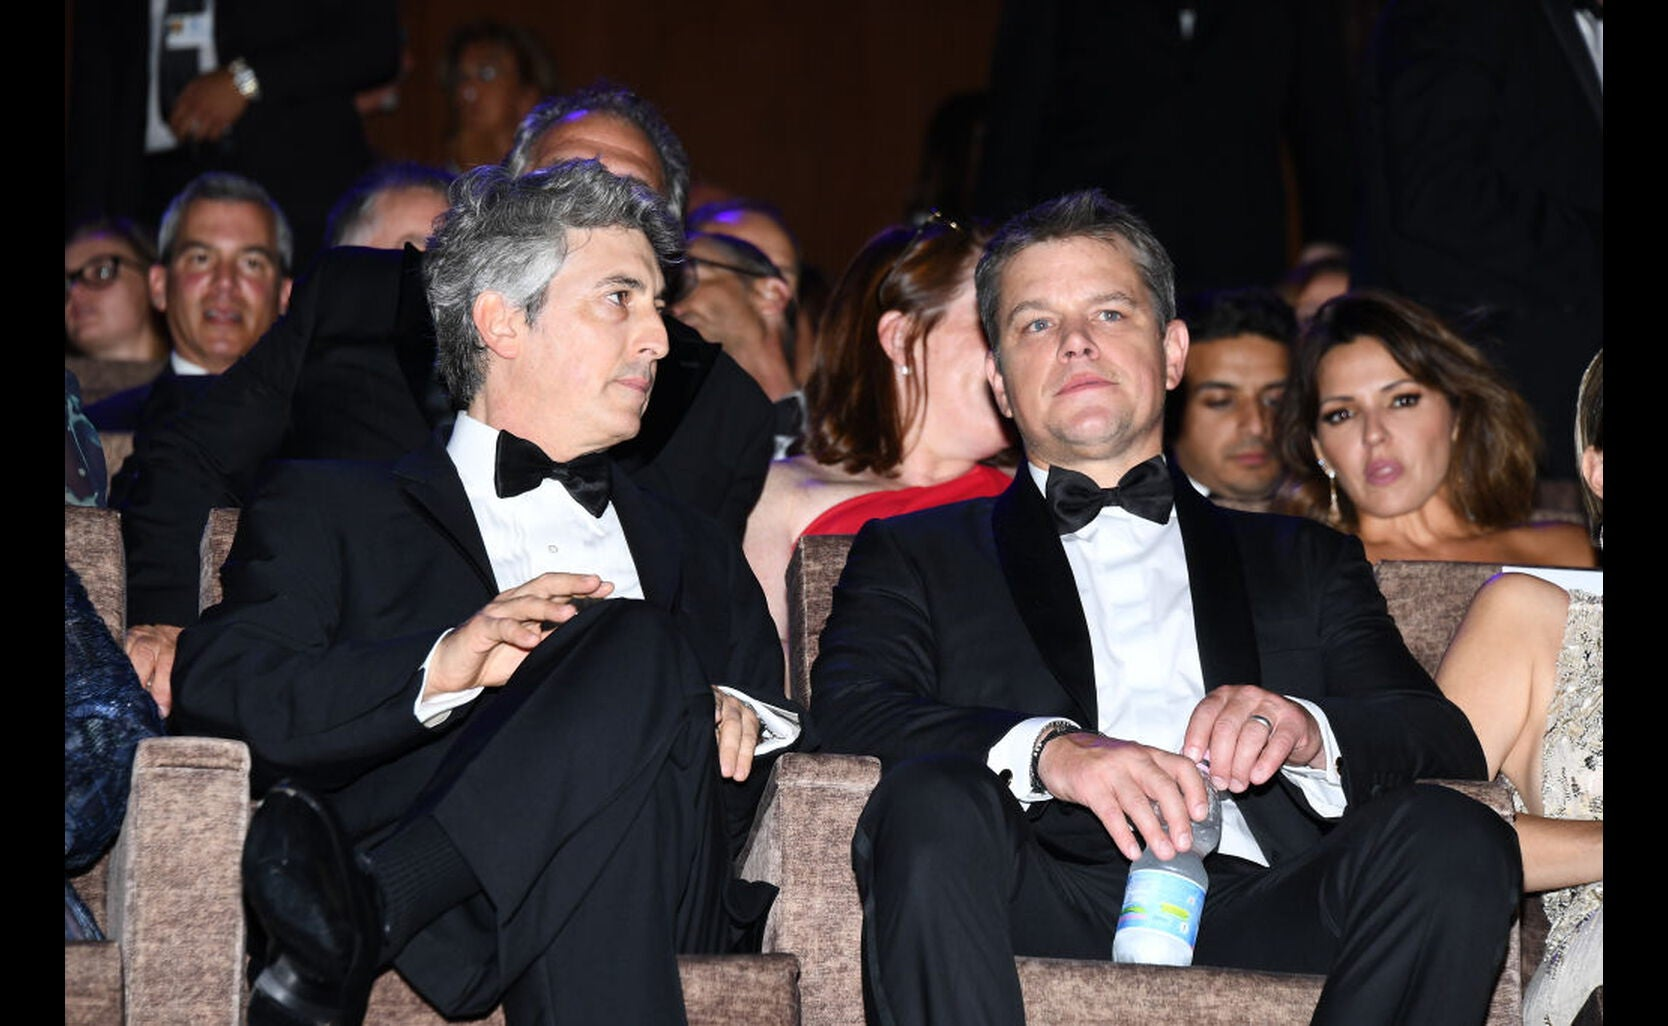 Director Alexander Payne and actor Matt Damon, Golden Globe winners, at the 2017 Venice Film Festival